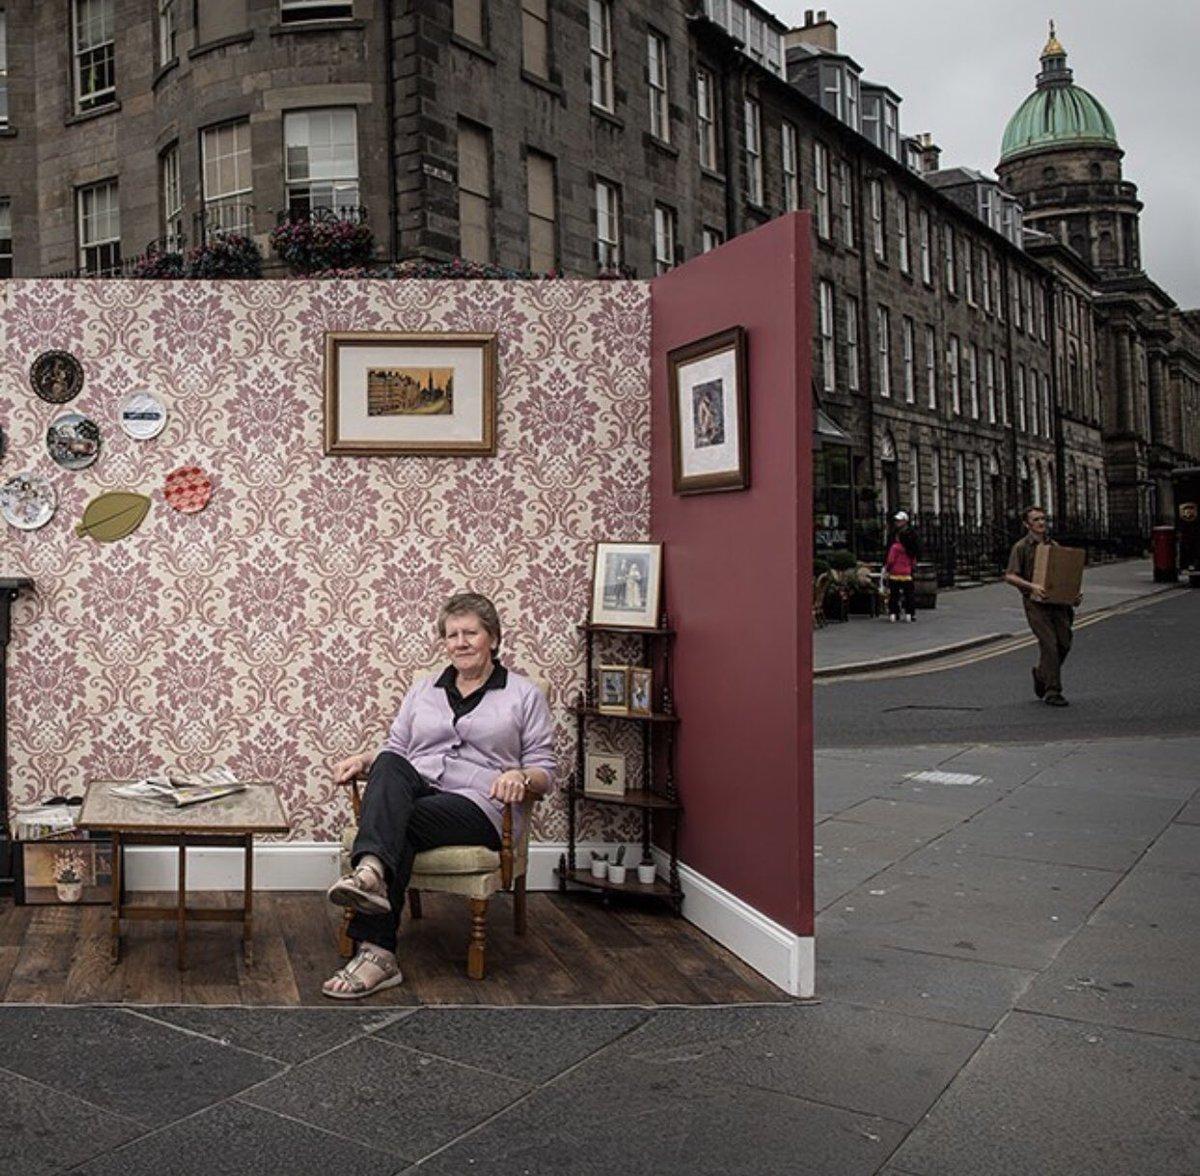 Step into our living room!  •The West End Character Project on-street photography exhibition will be launched on August 1st, 2018.   #edinburghswestend #takeacloserlook #hiddengems #edinburgh #hiddenedinburgh #discoveredinburgh #edinburghlife  @info_dereka